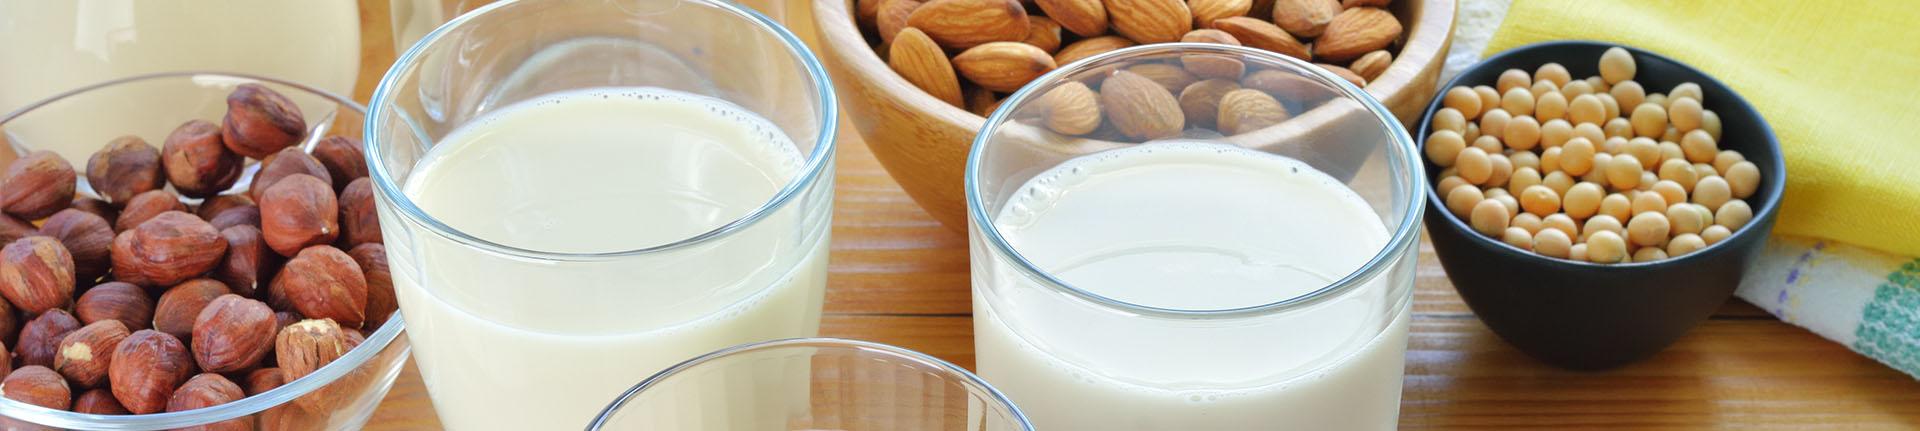 Tipos de leite alternativos ao leite de vaca